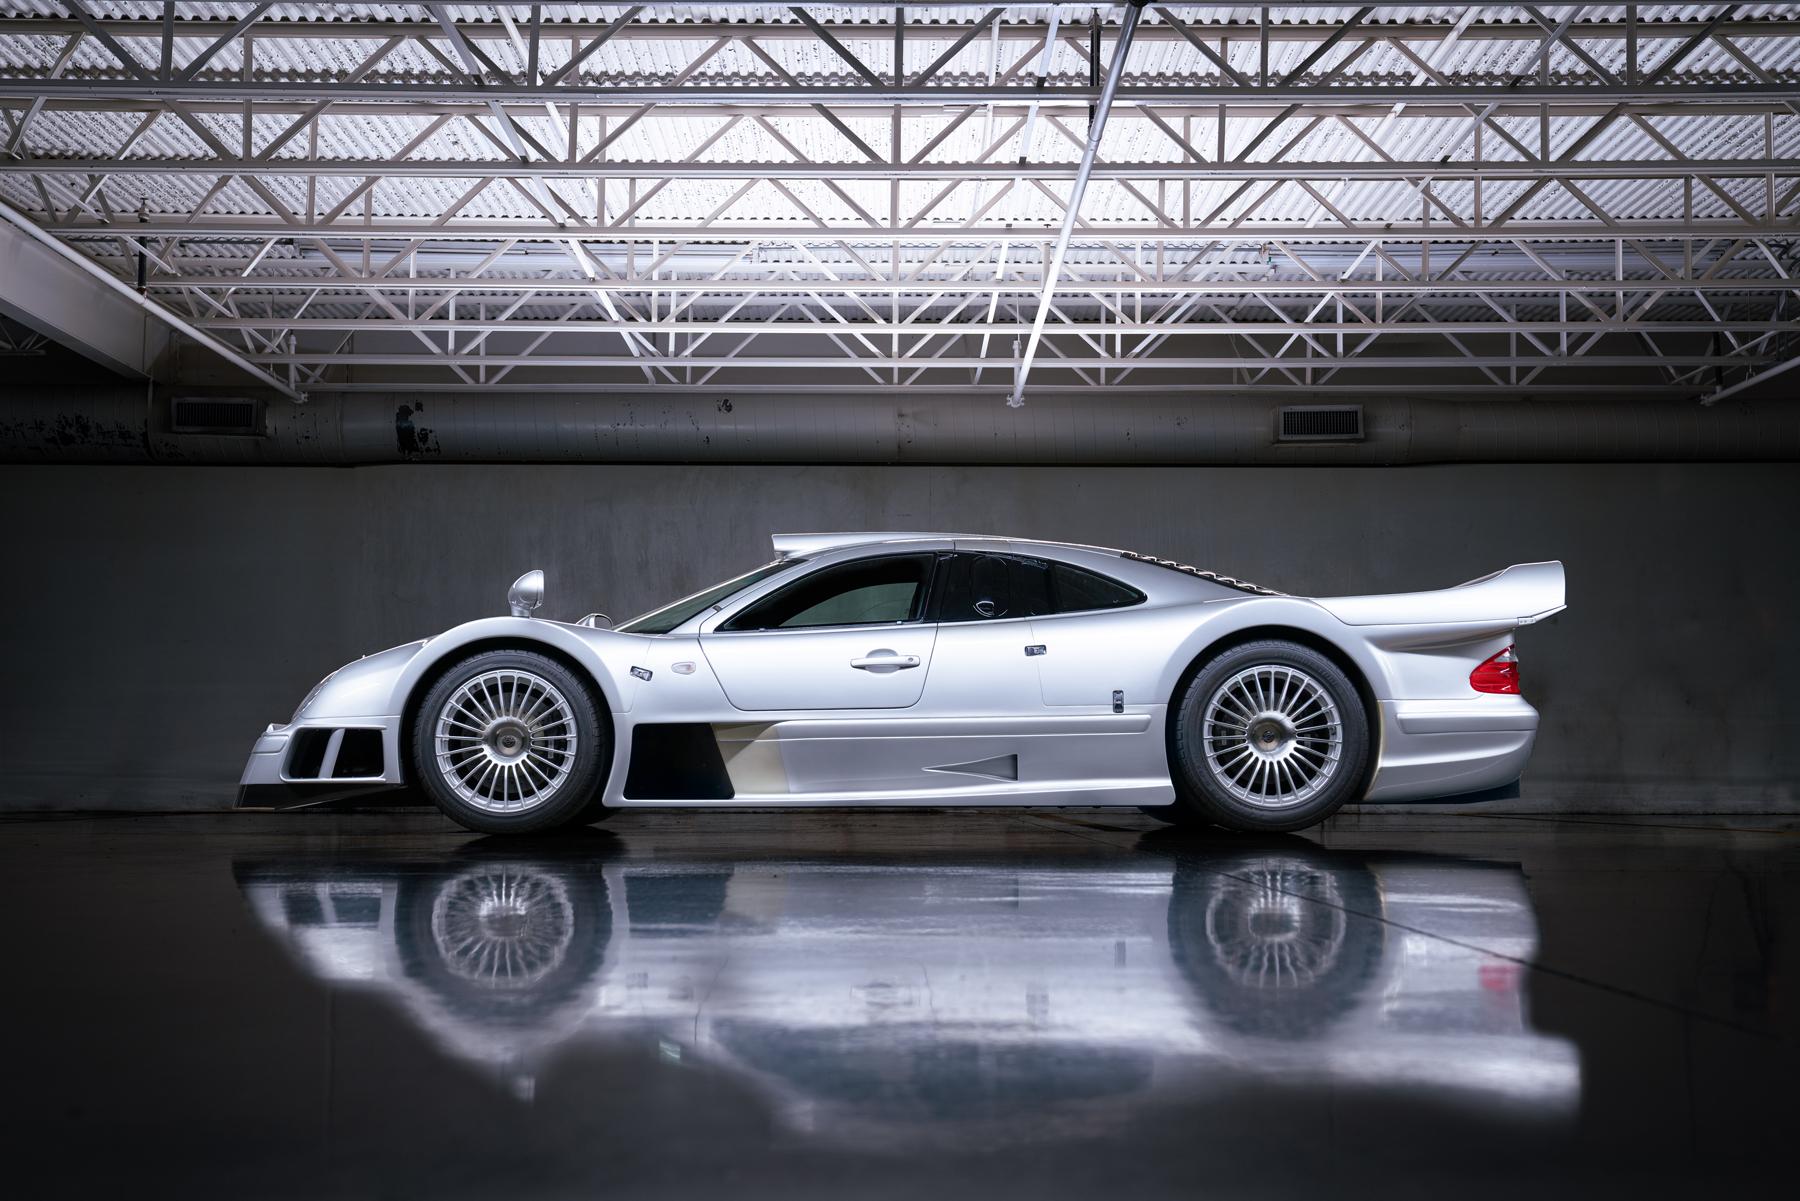 1998 Mercedes-Benz AMG CLK GTR side profile studio